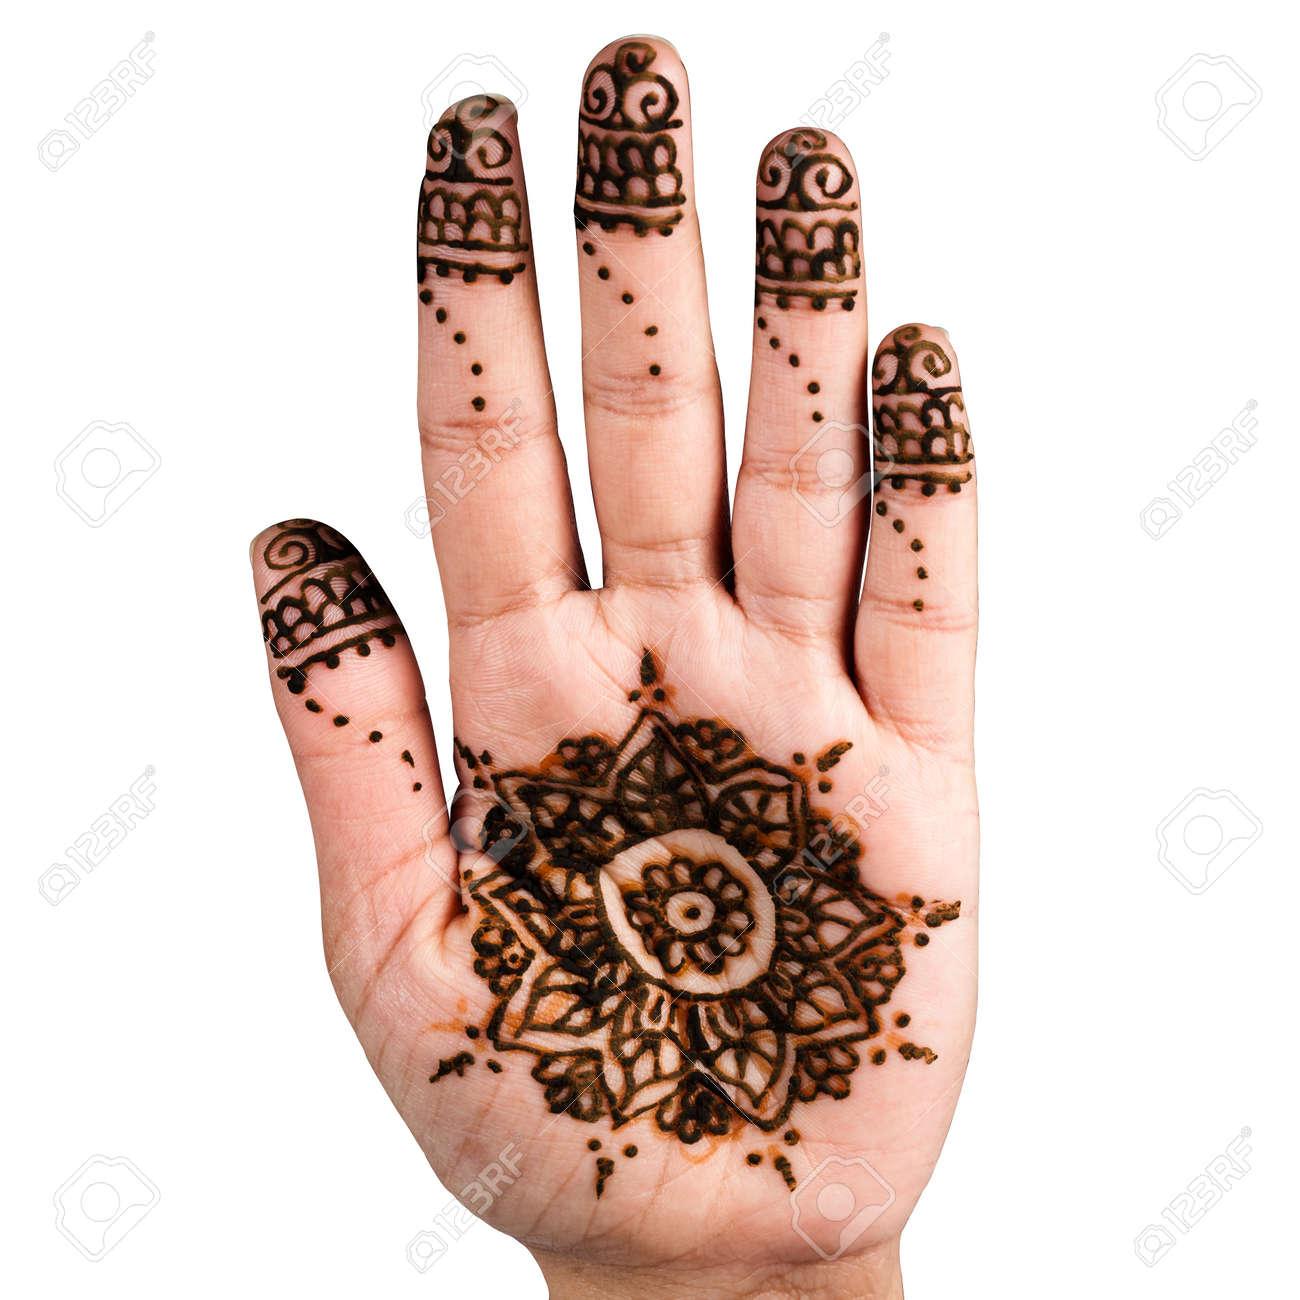 Henna Hand Tattoo Decoration Art Clipping Path Square White